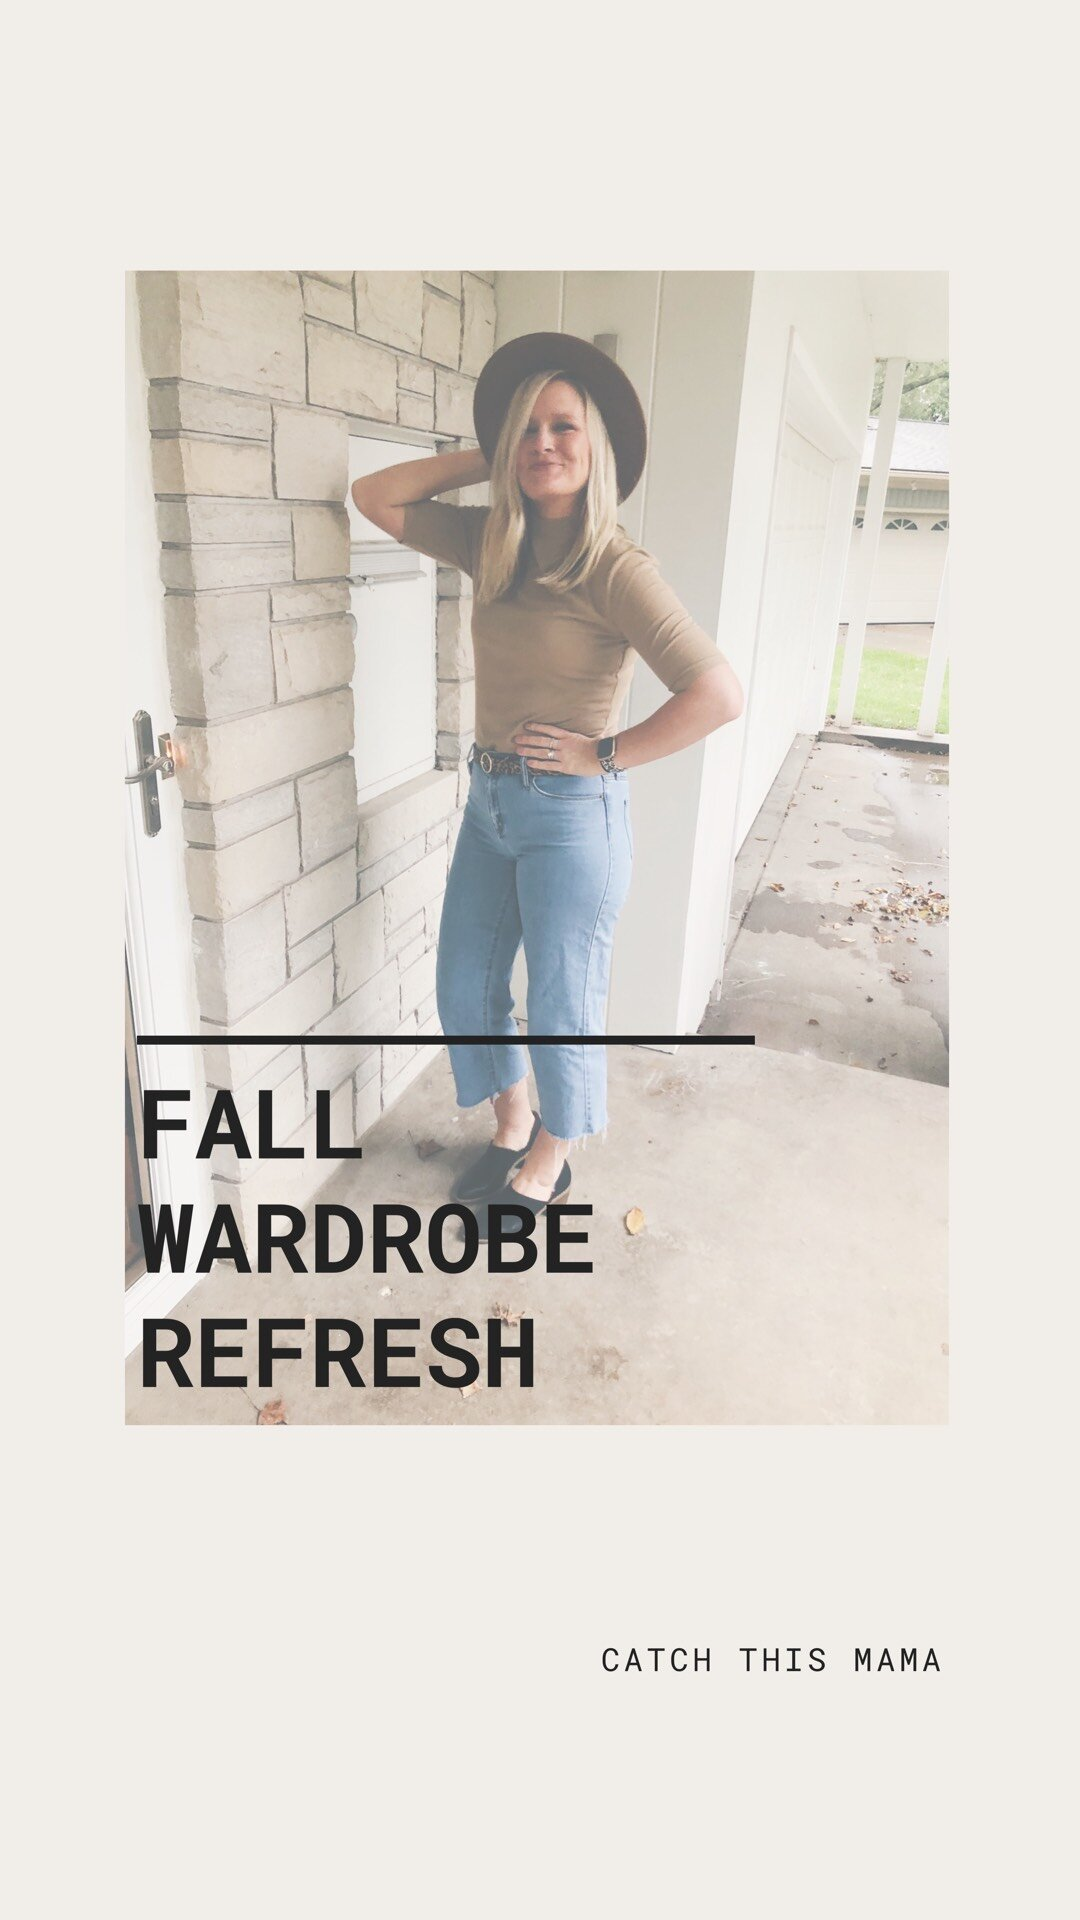 Fall wardrobe refresh.jpeg